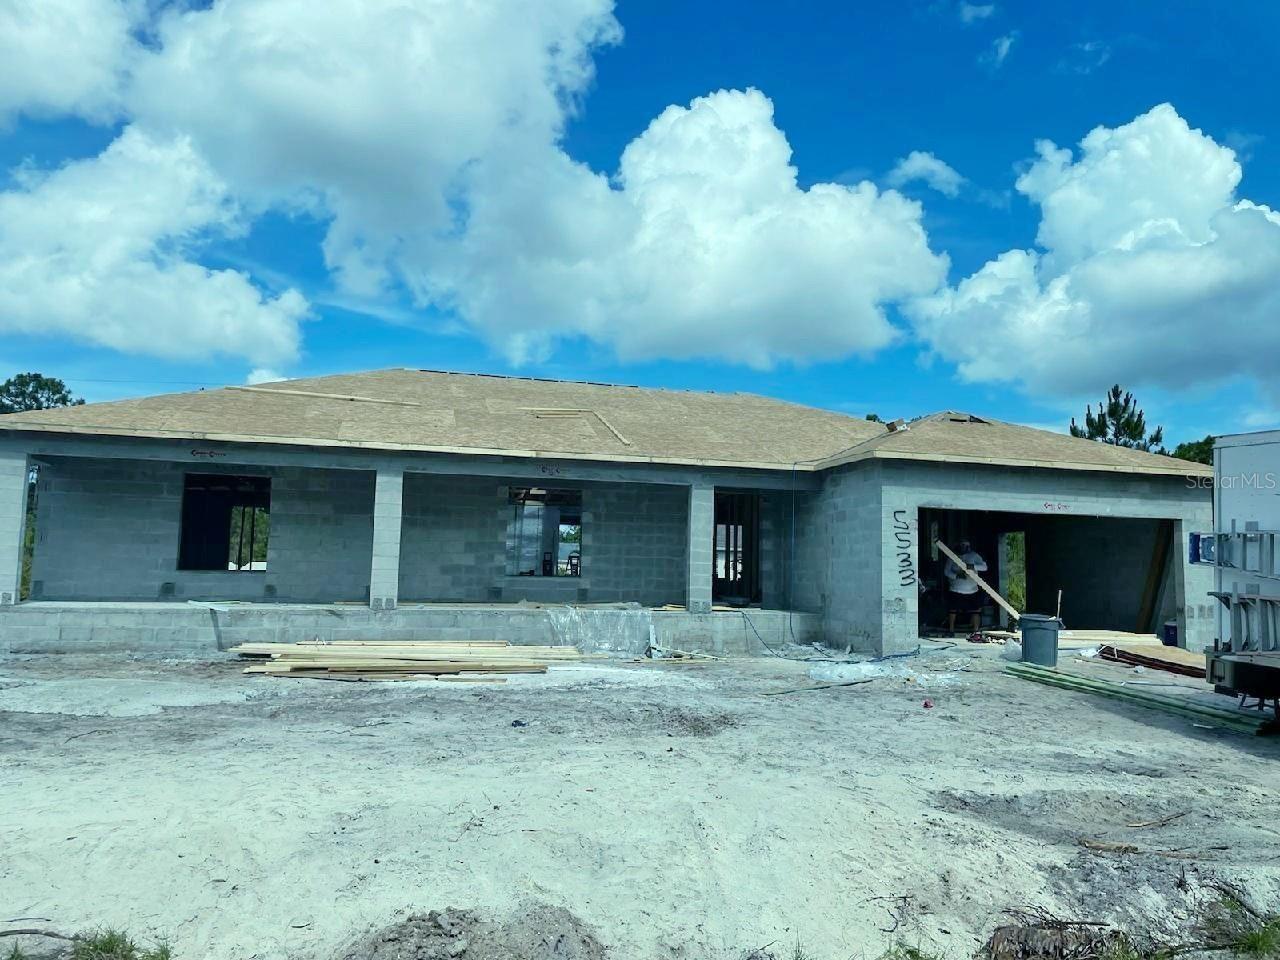 Photo of 5533 GULFPORT TERRACE, PORT CHARLOTTE, FL 33981 (MLS # A4502519)